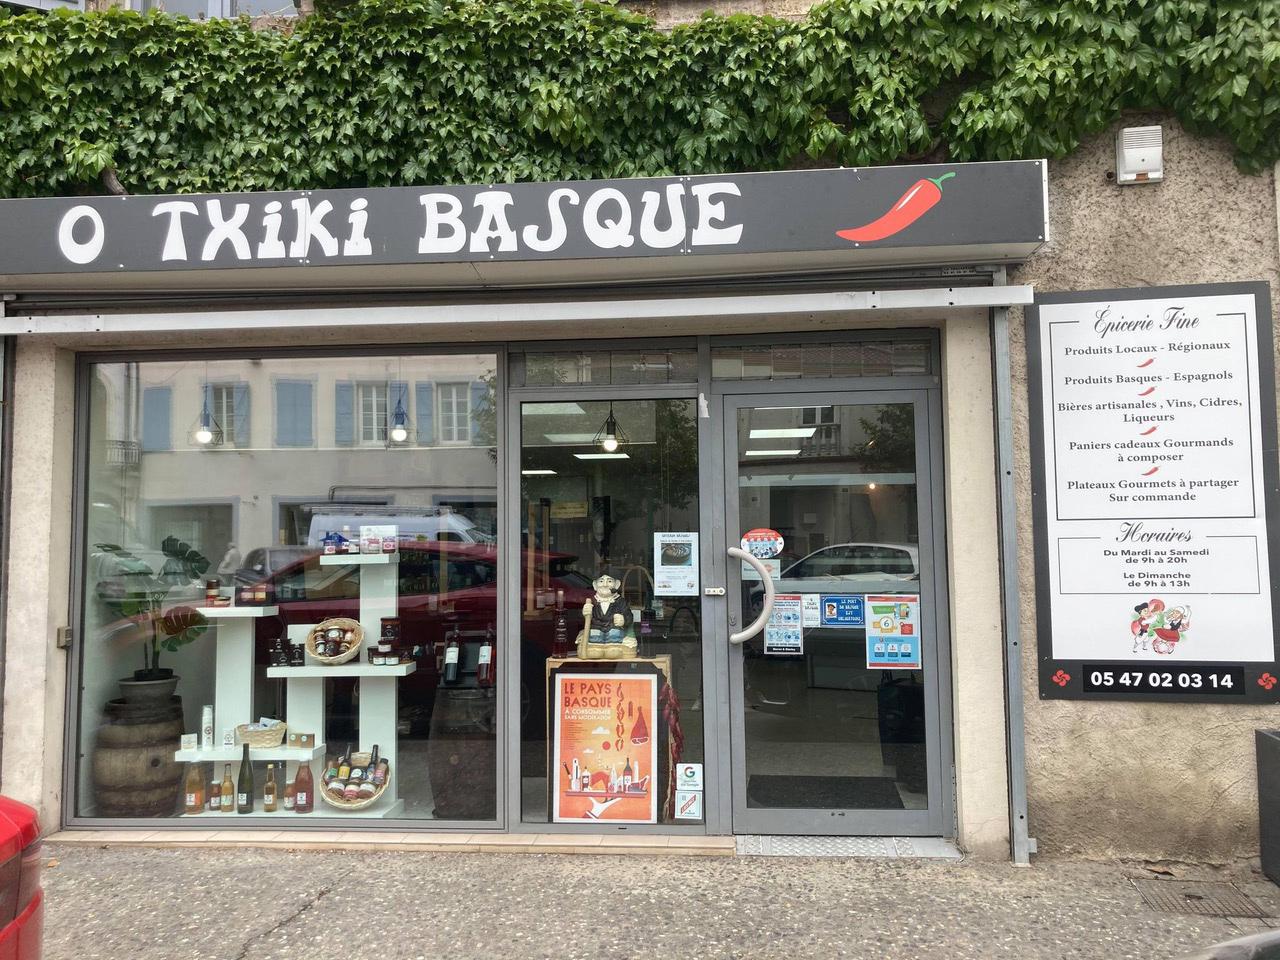 Ô Txiki Basque à Cazères